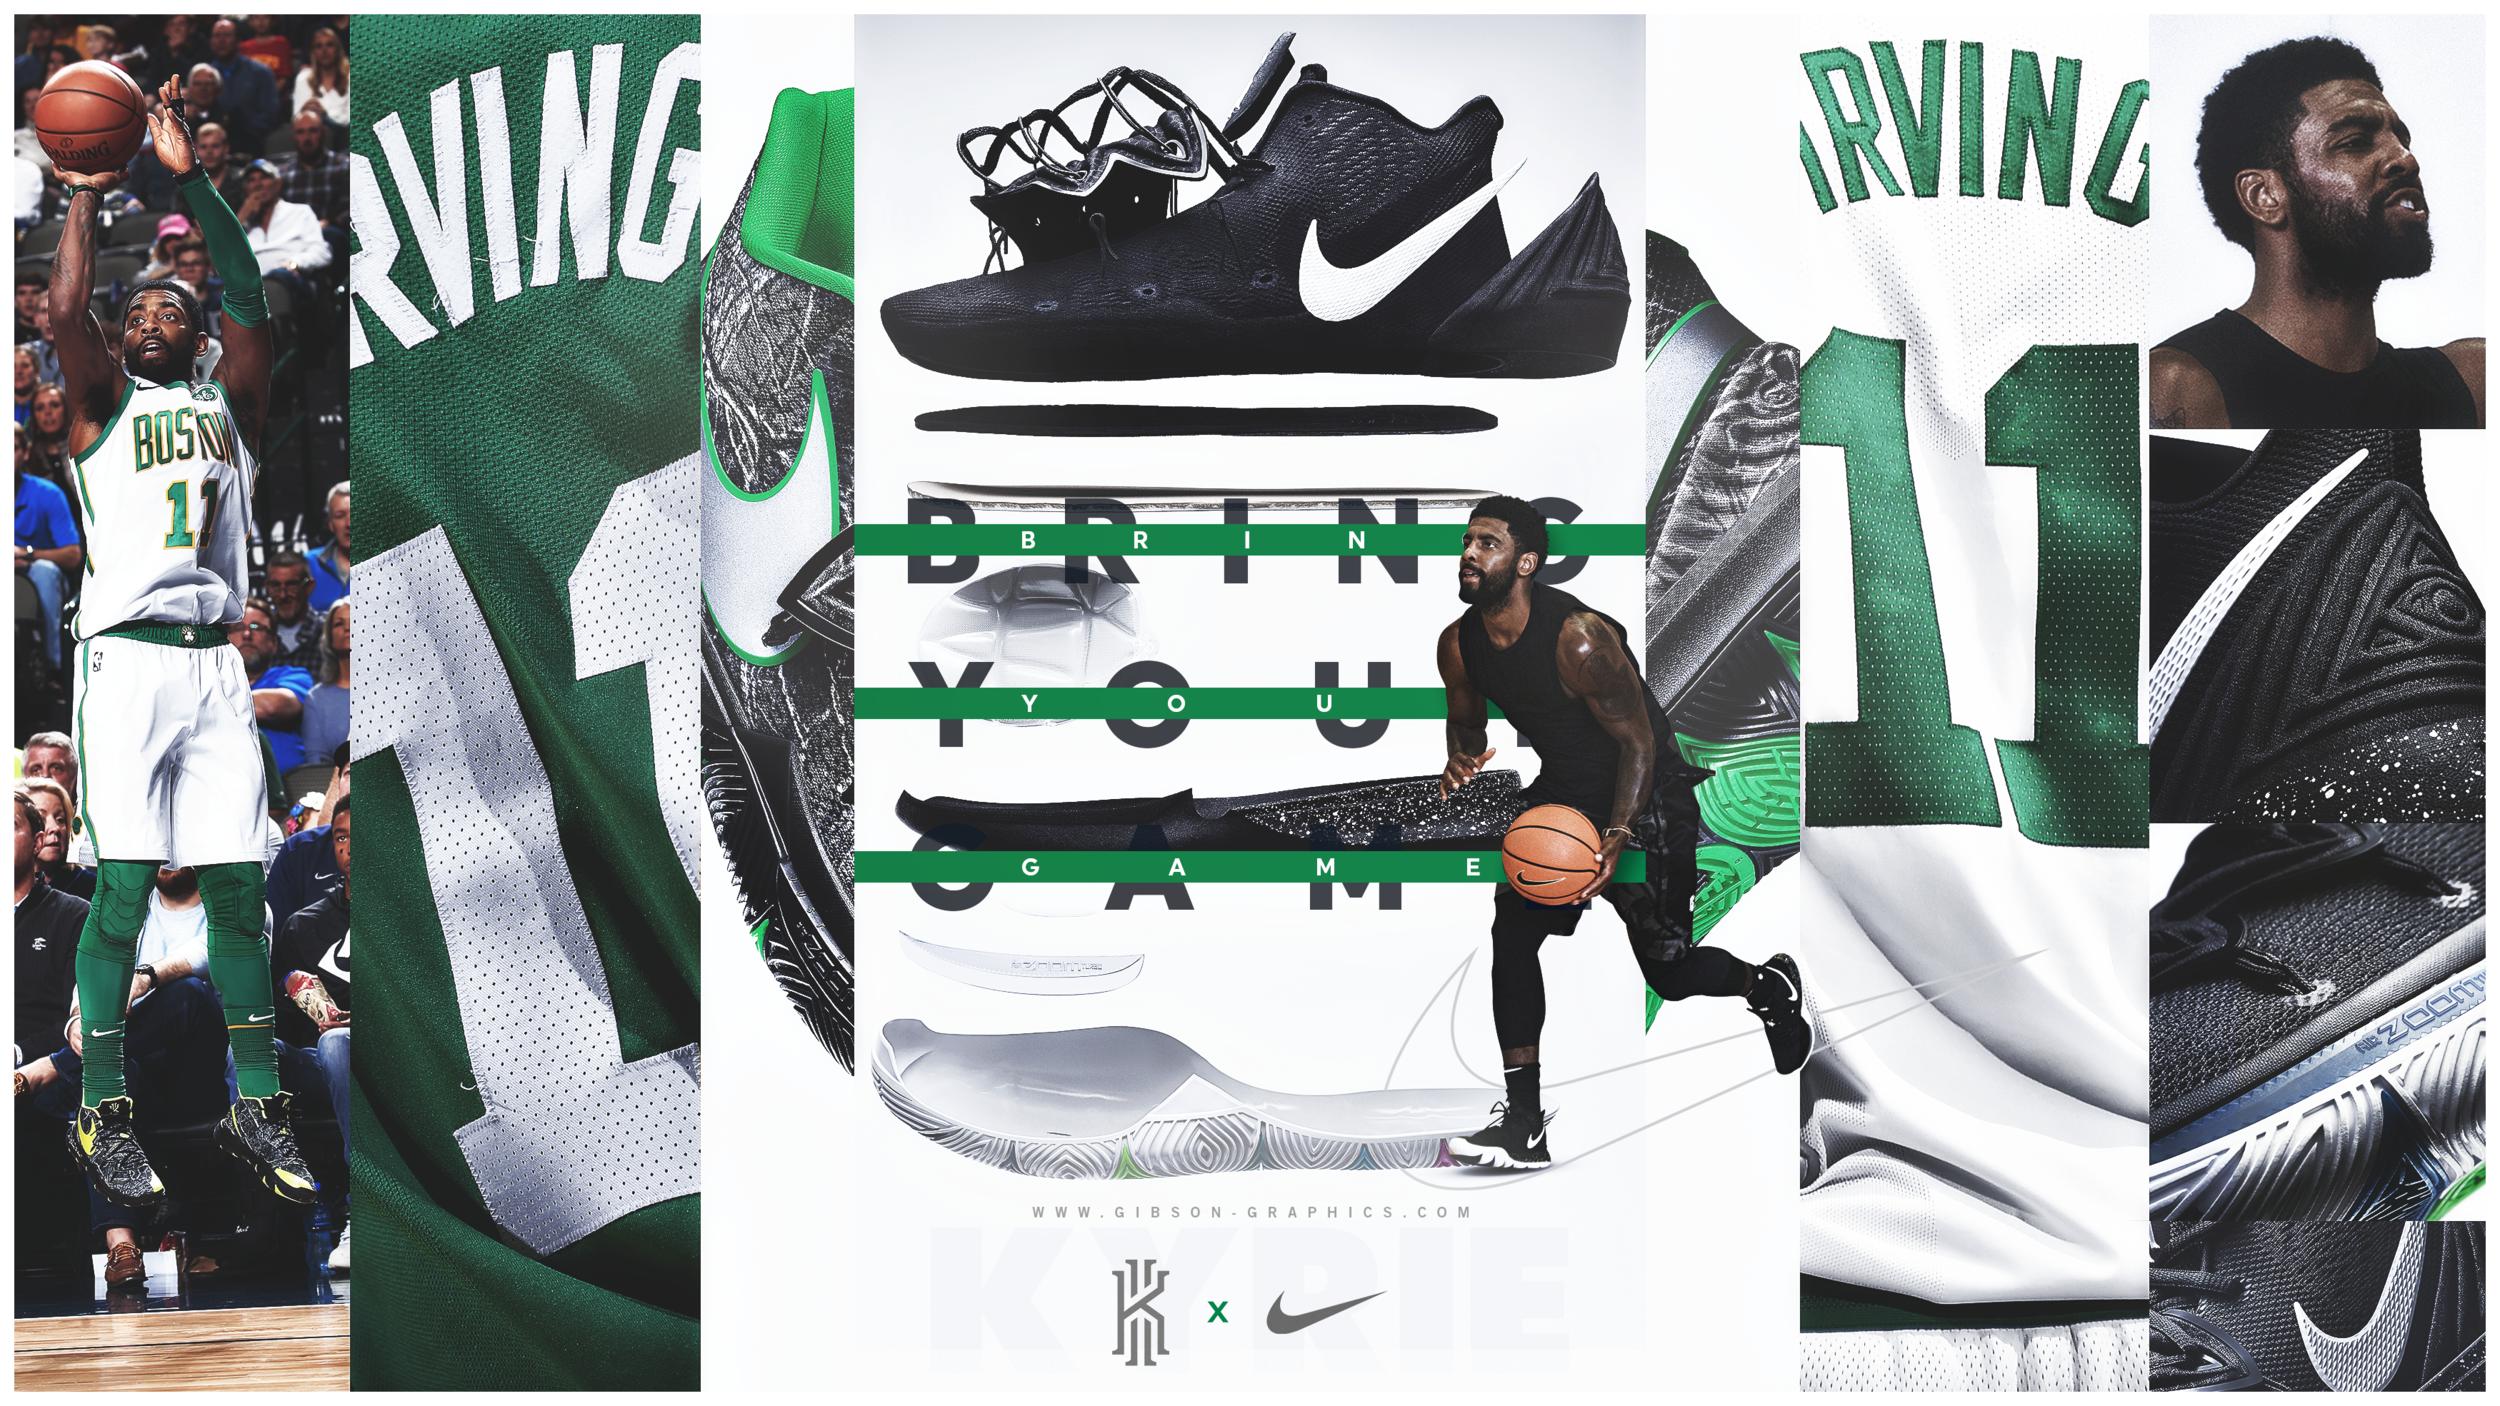 Boston Celtics Kyrie 5 Shoe Graphic